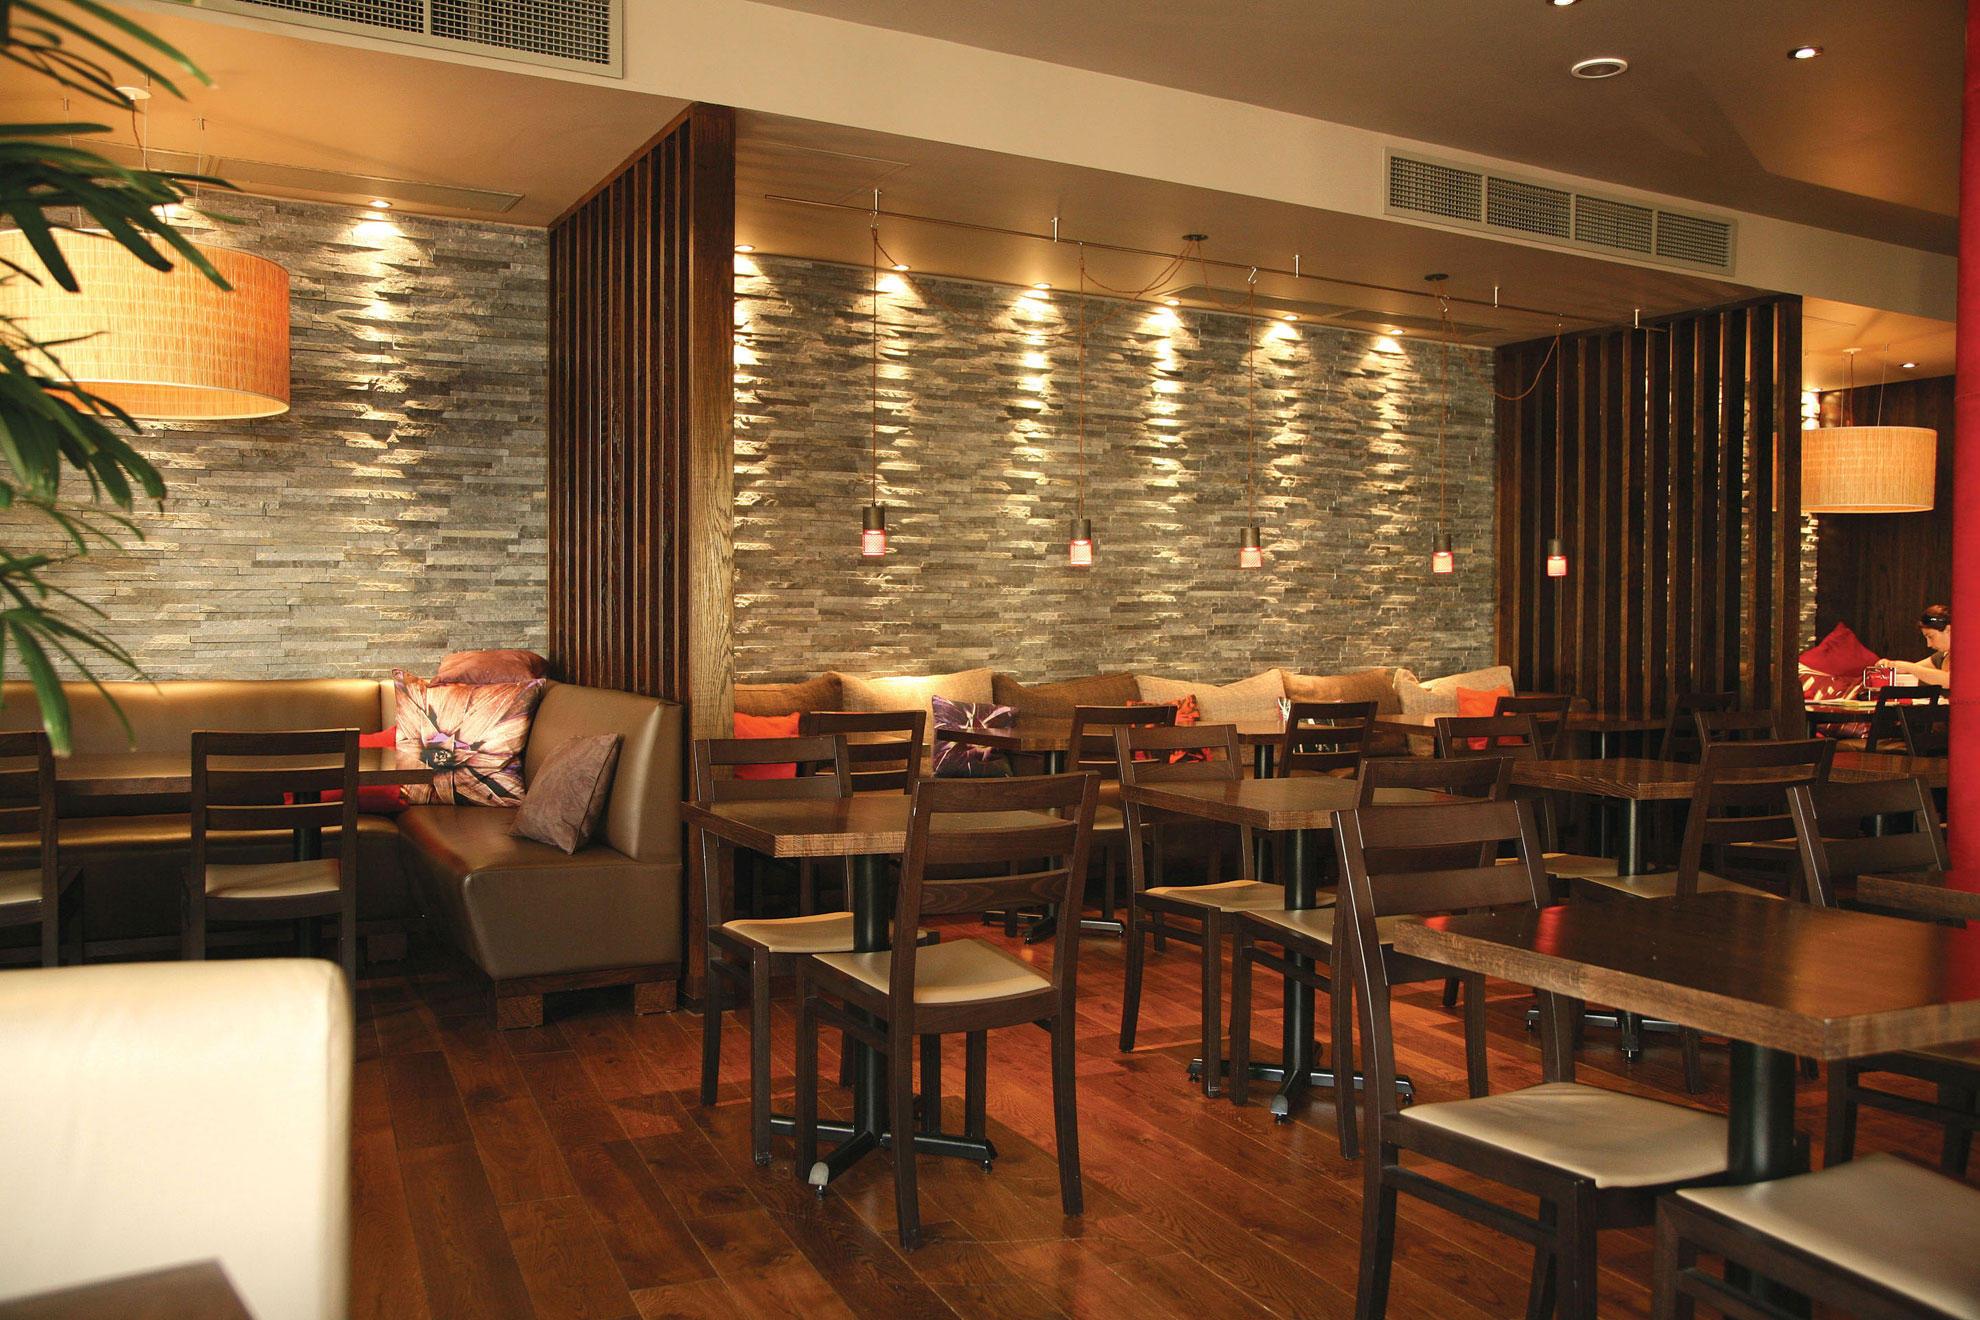 ambient images - Slate Cafe Decoration